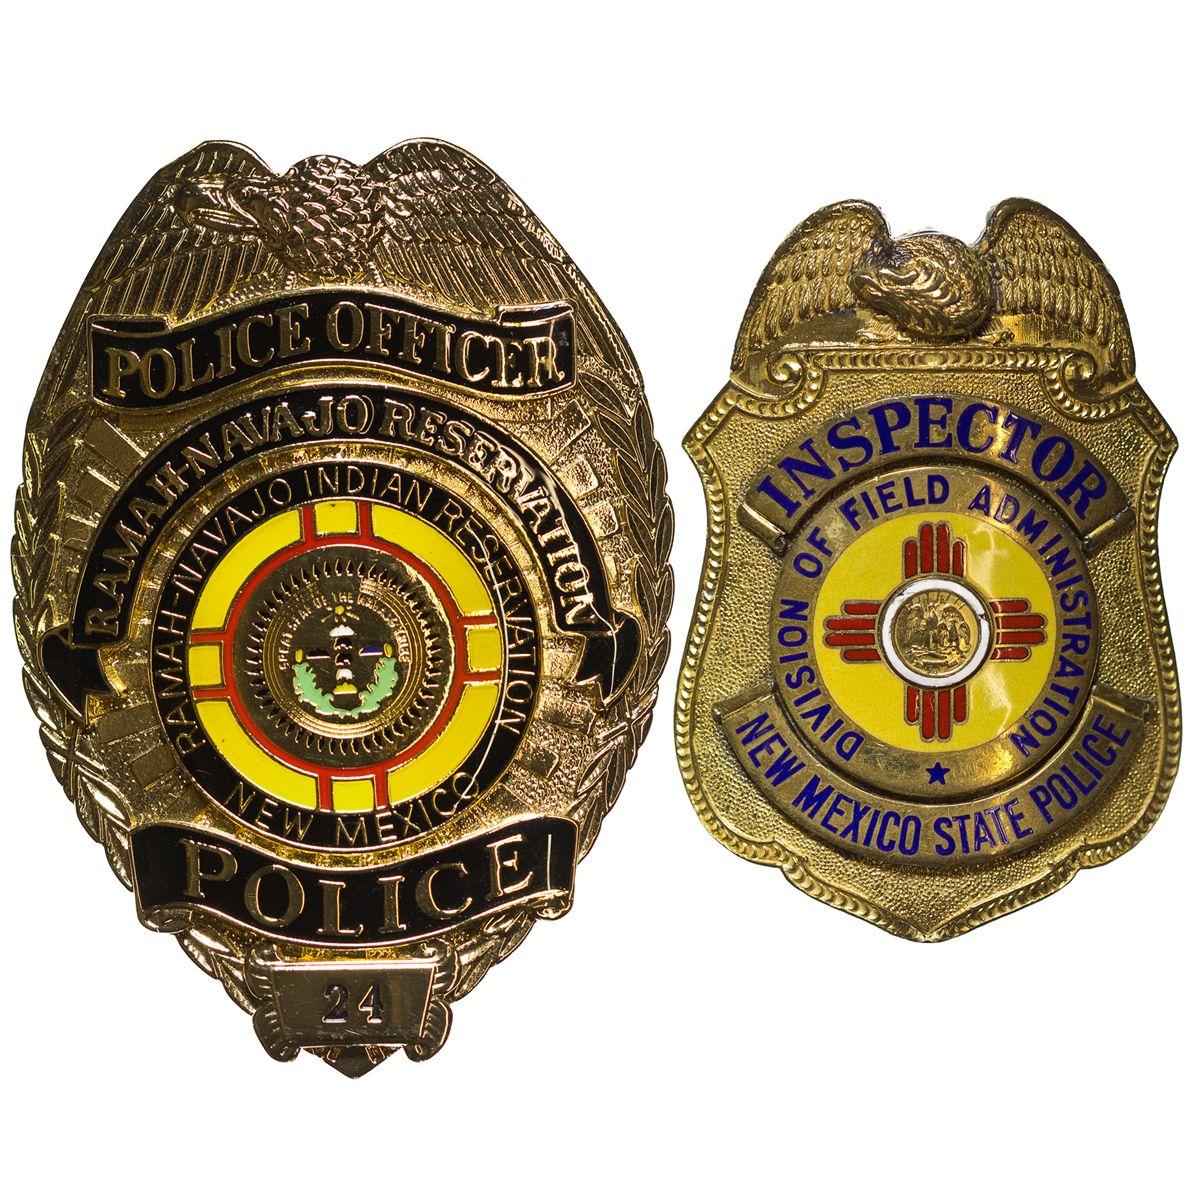 NM - Lincoln County,Police Badge, Ramah-Navajo, and Inspector Badge